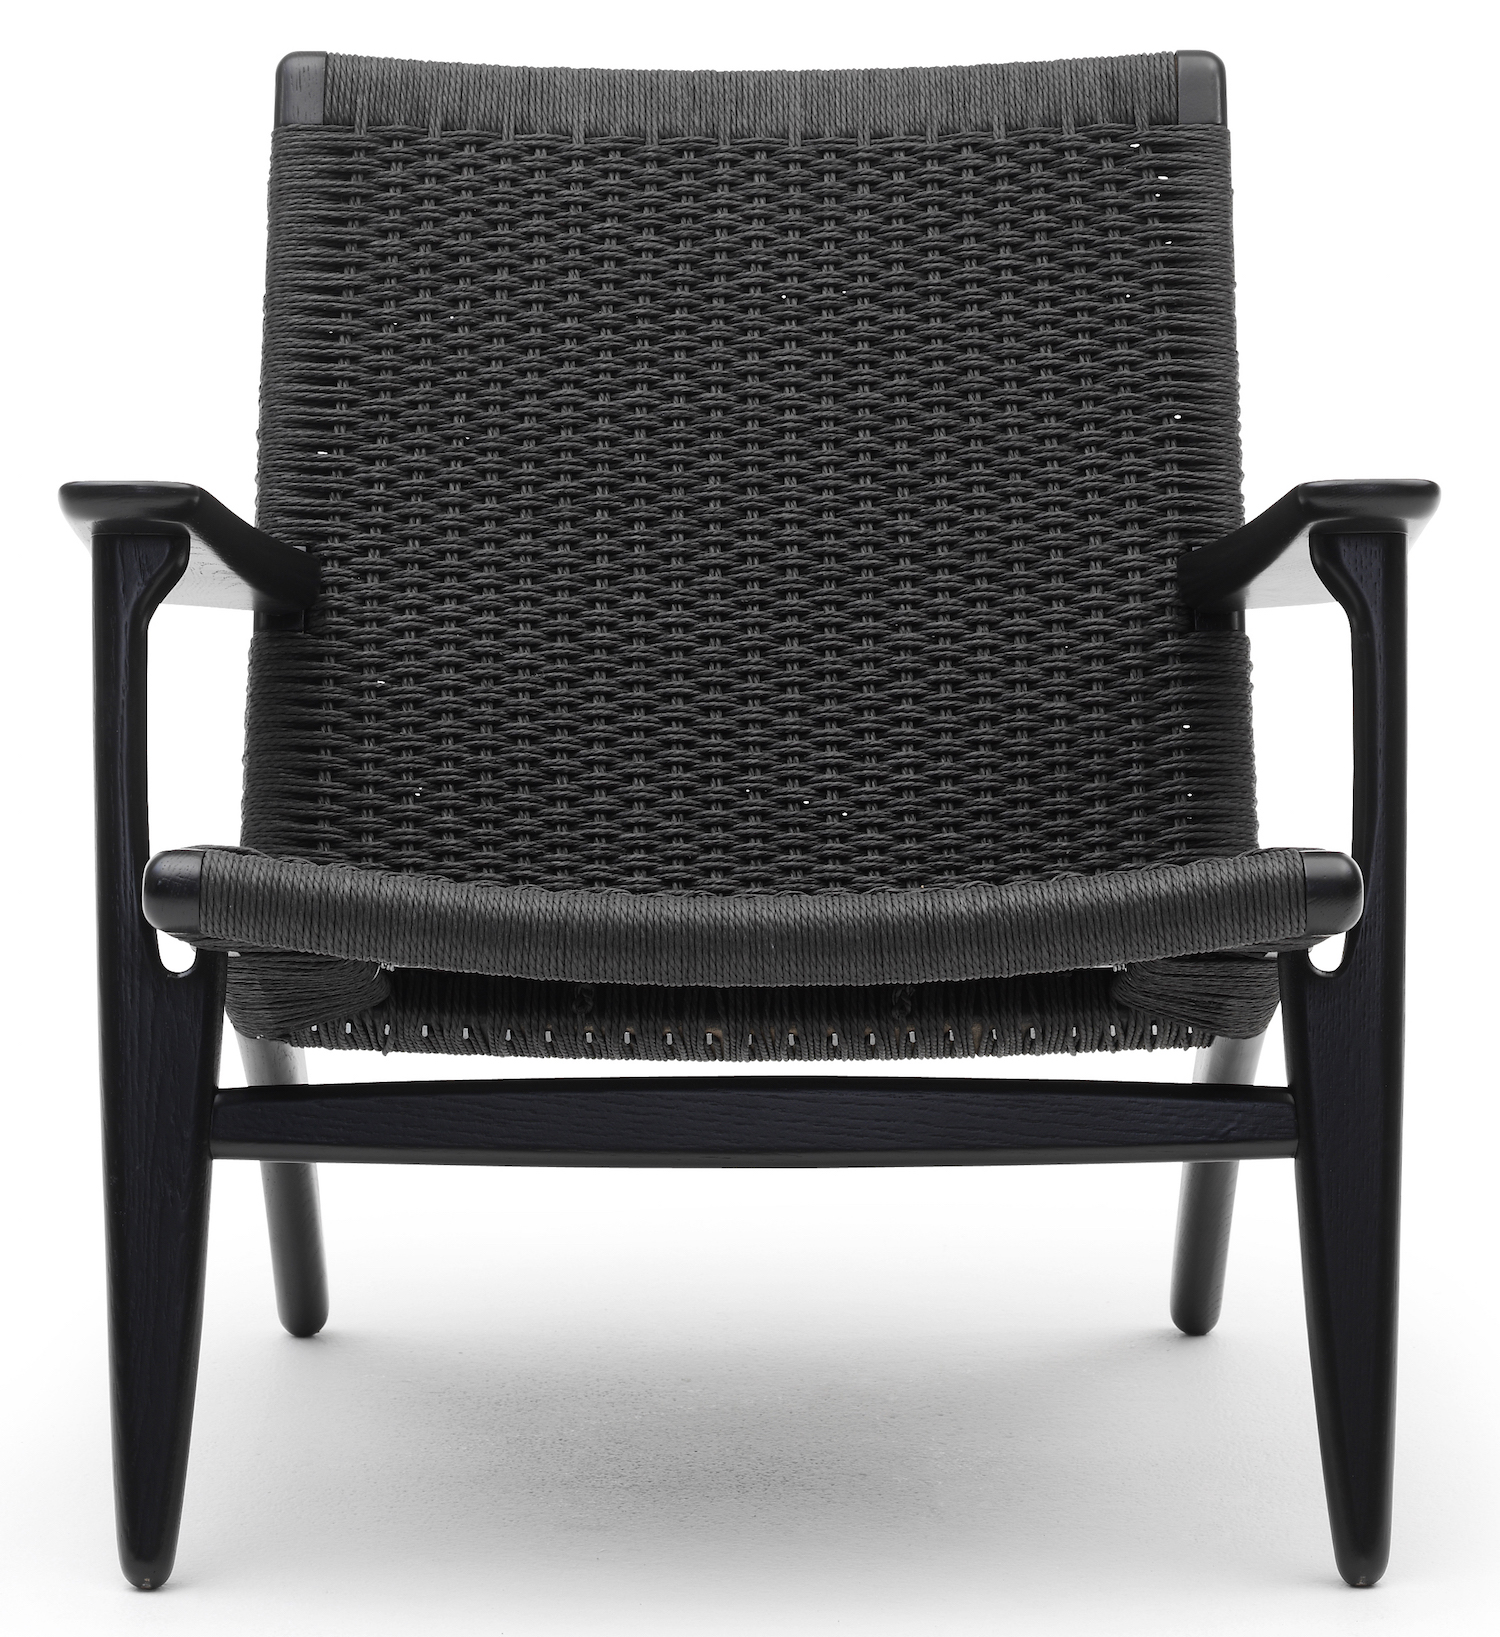 carl hansen s n fauteuil ch25 hans wegner. Black Bedroom Furniture Sets. Home Design Ideas